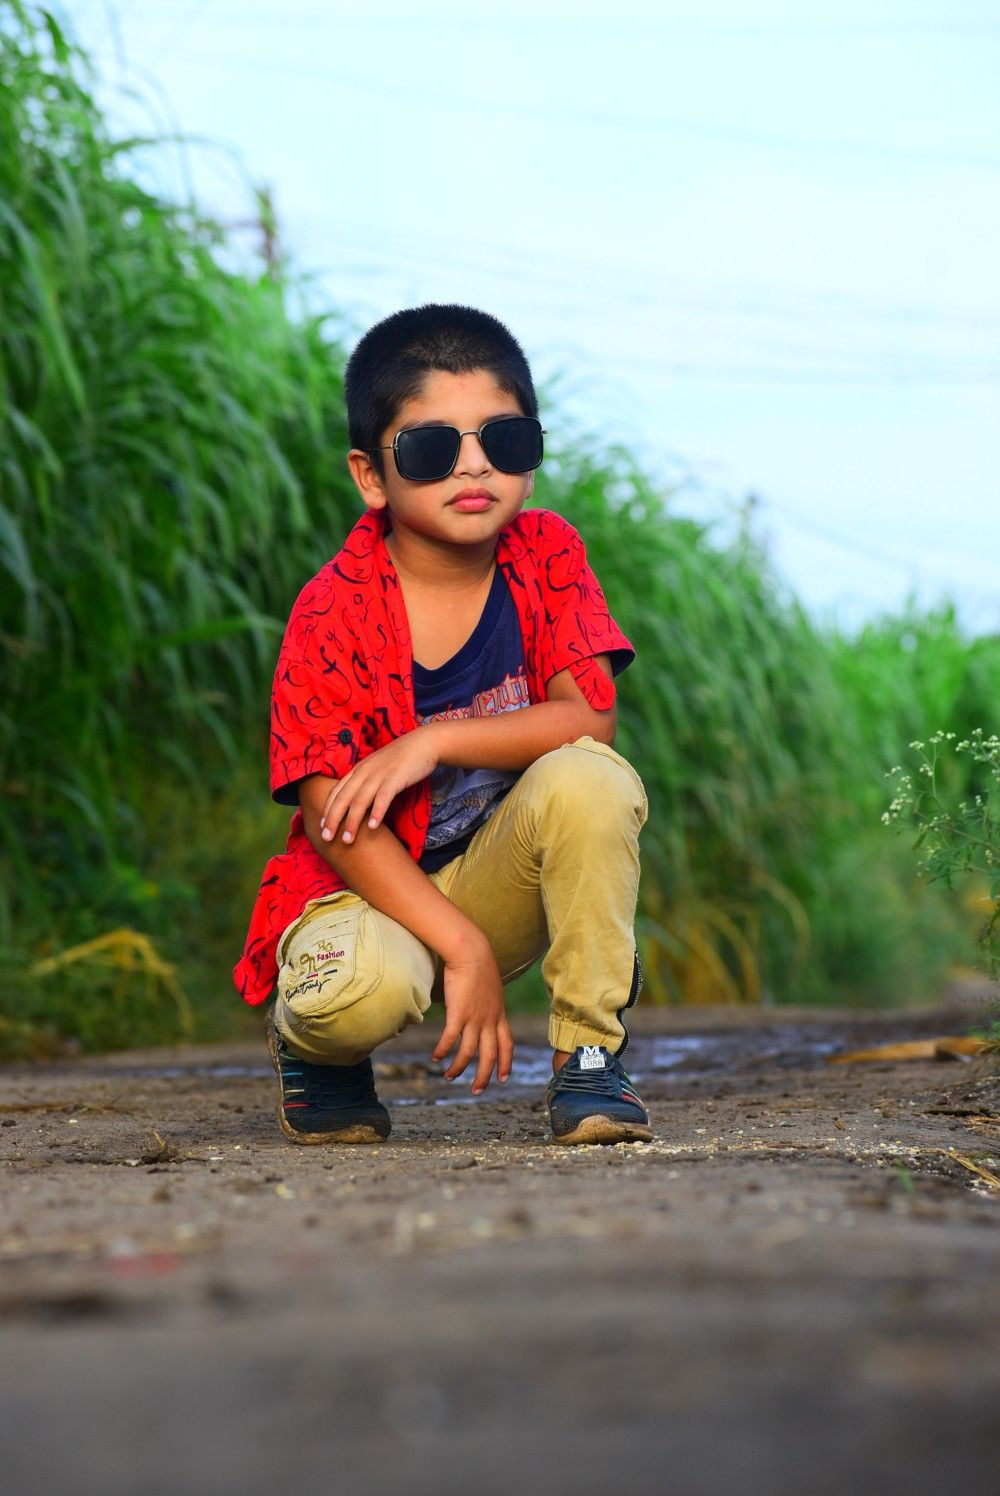 Cute Little Boy Attitude Wallpaper Photo Cute Little Boys Boys Wallpaper Little Boys